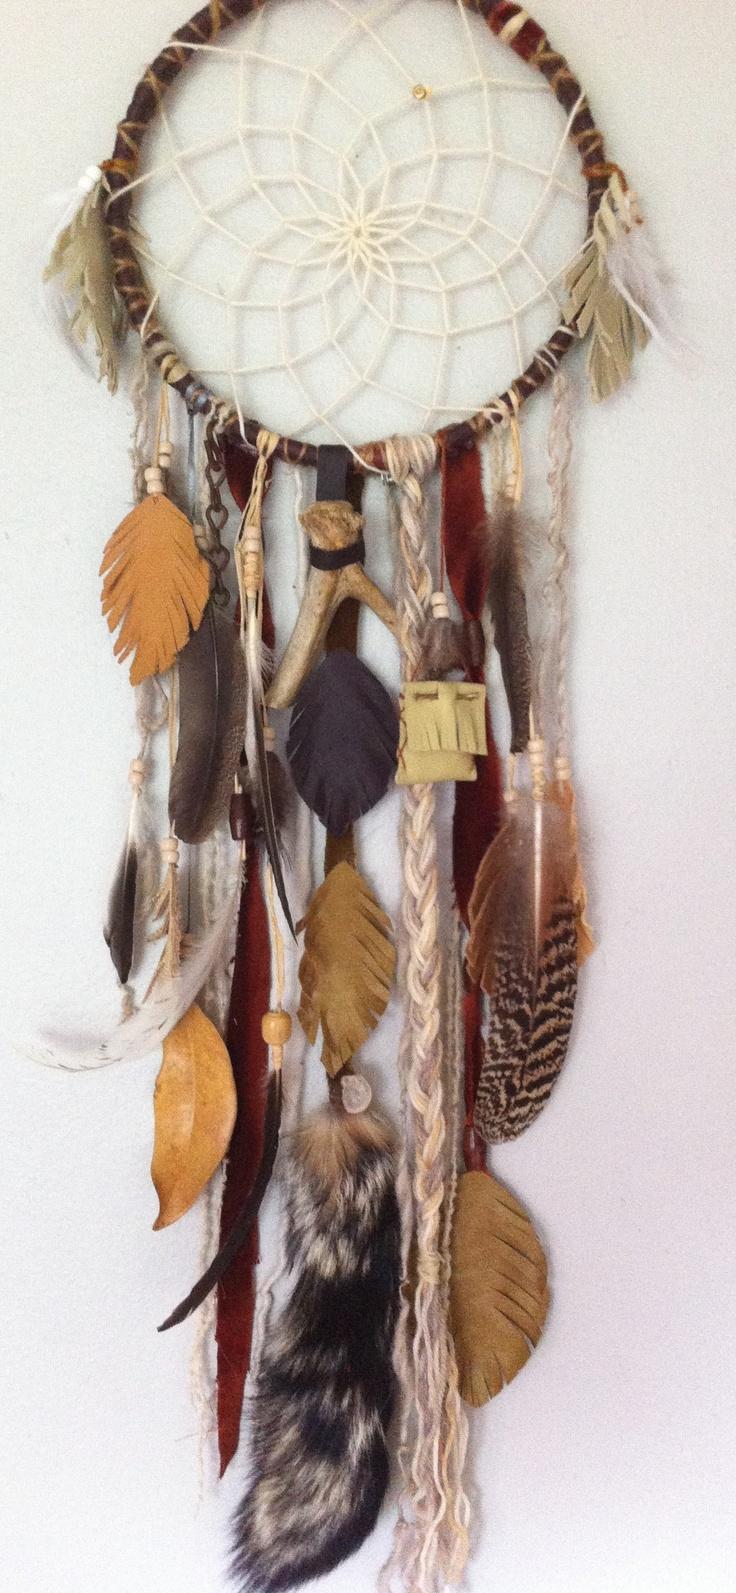 dreamcatcher with sleep medicine mojo bag and deer antler by rachael rice http://rachaelrice.com/art/custom-orders